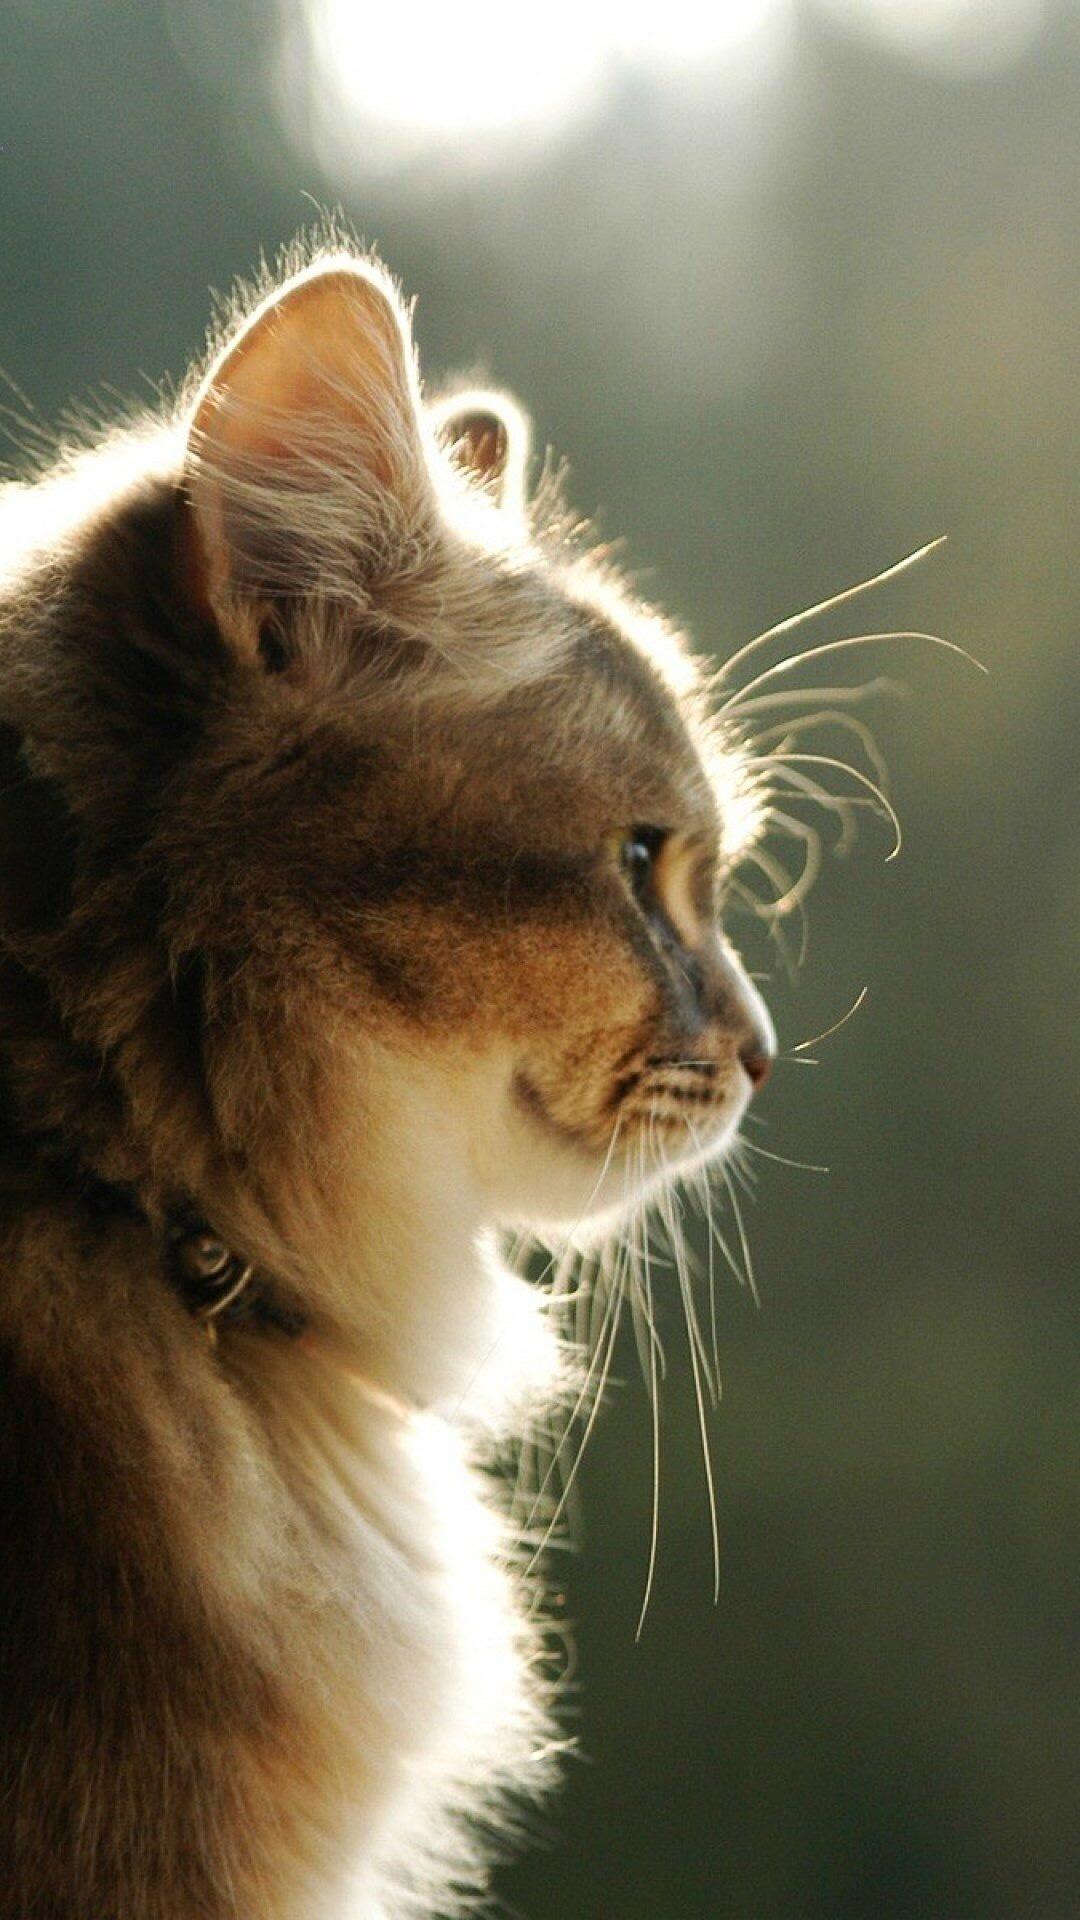 Красивые картинки на телефона на заставку кошки и котики - подборка 12